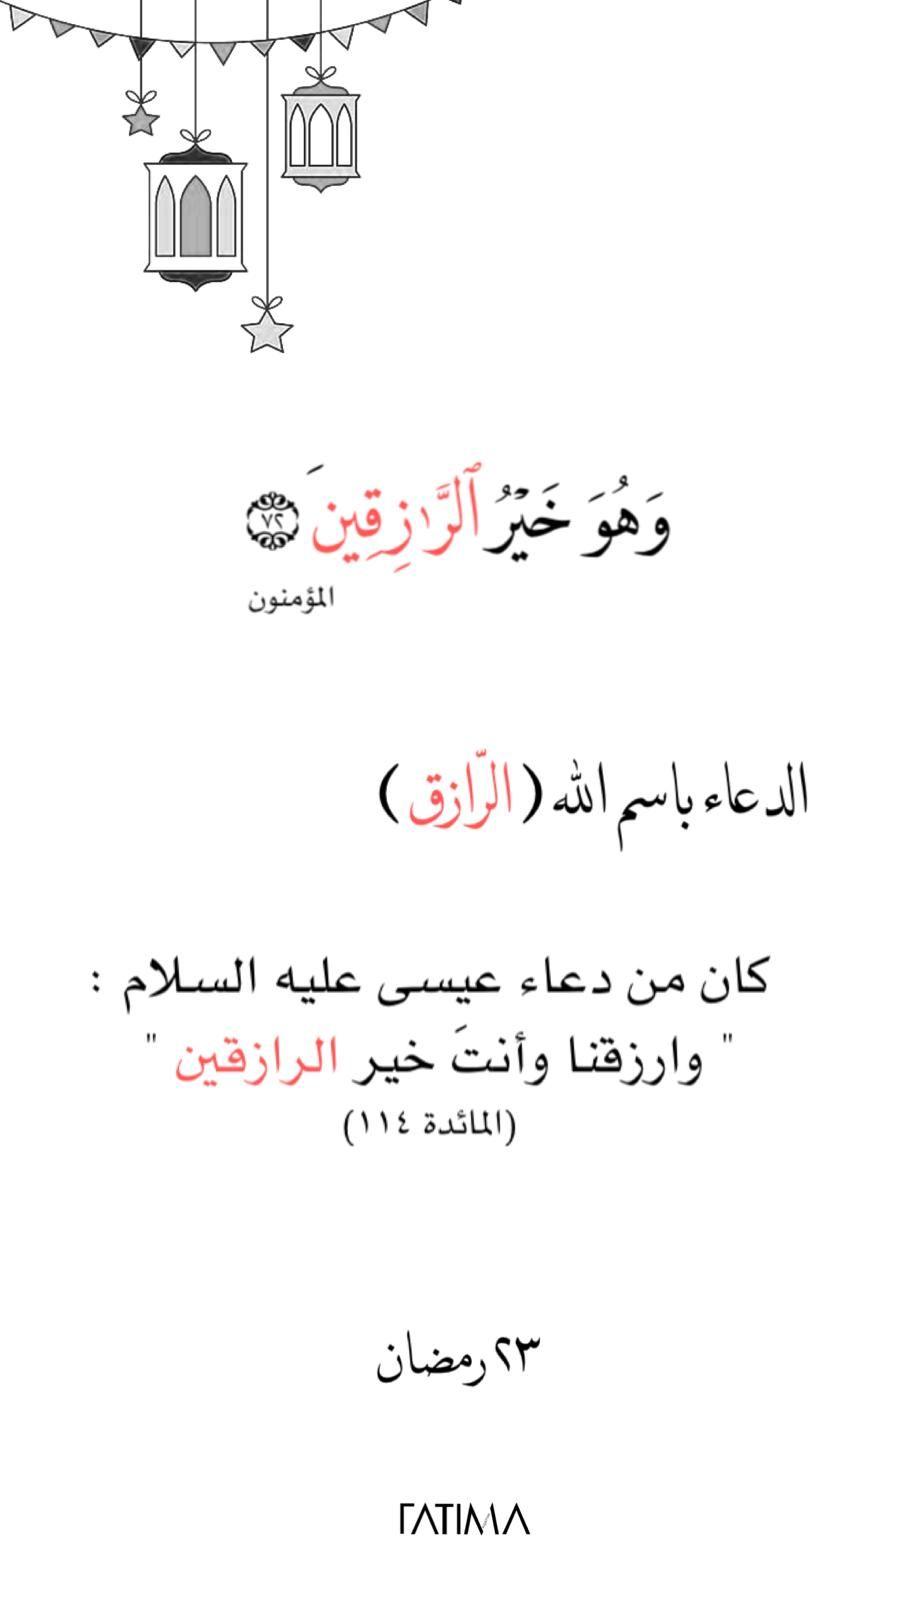 Ramadan Kareem رمضان دعاء ذكر Quran Quotes Quran Verses Ramadan Day